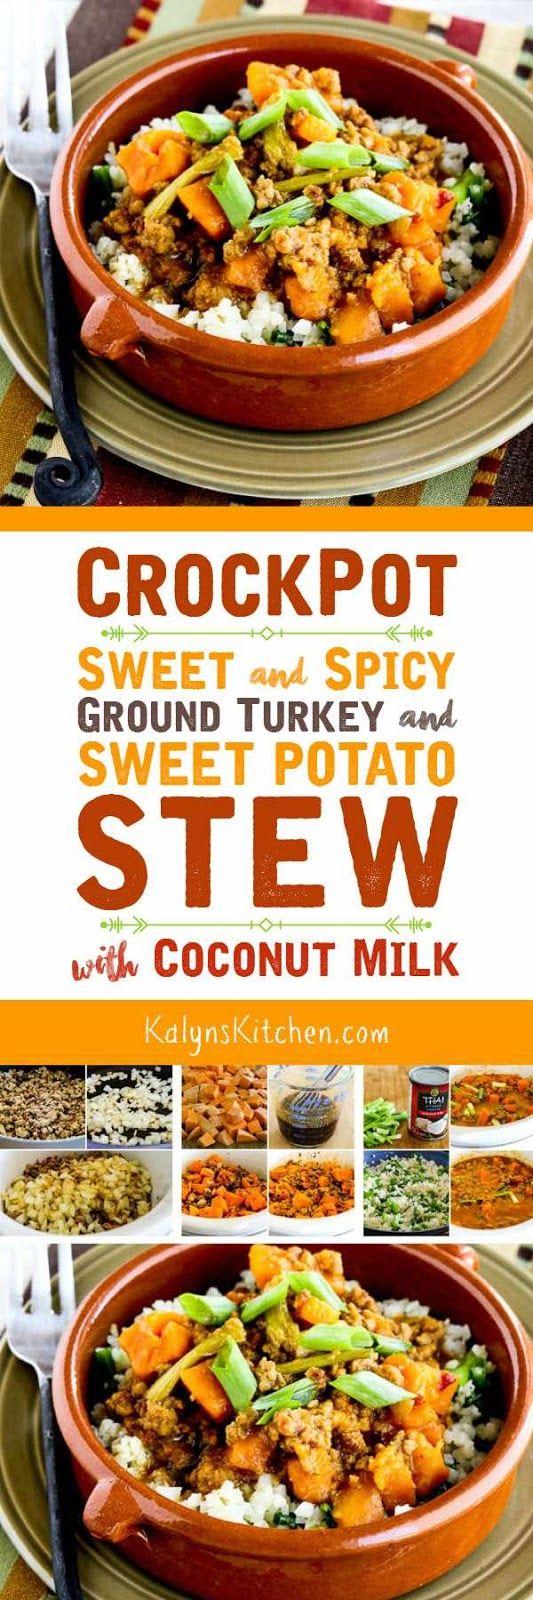 CrockPot Sweet and Spicy Ground Turkey and Sweet Potato Stew Recipe with Coconut Milk found on KalynsKitchen.com.